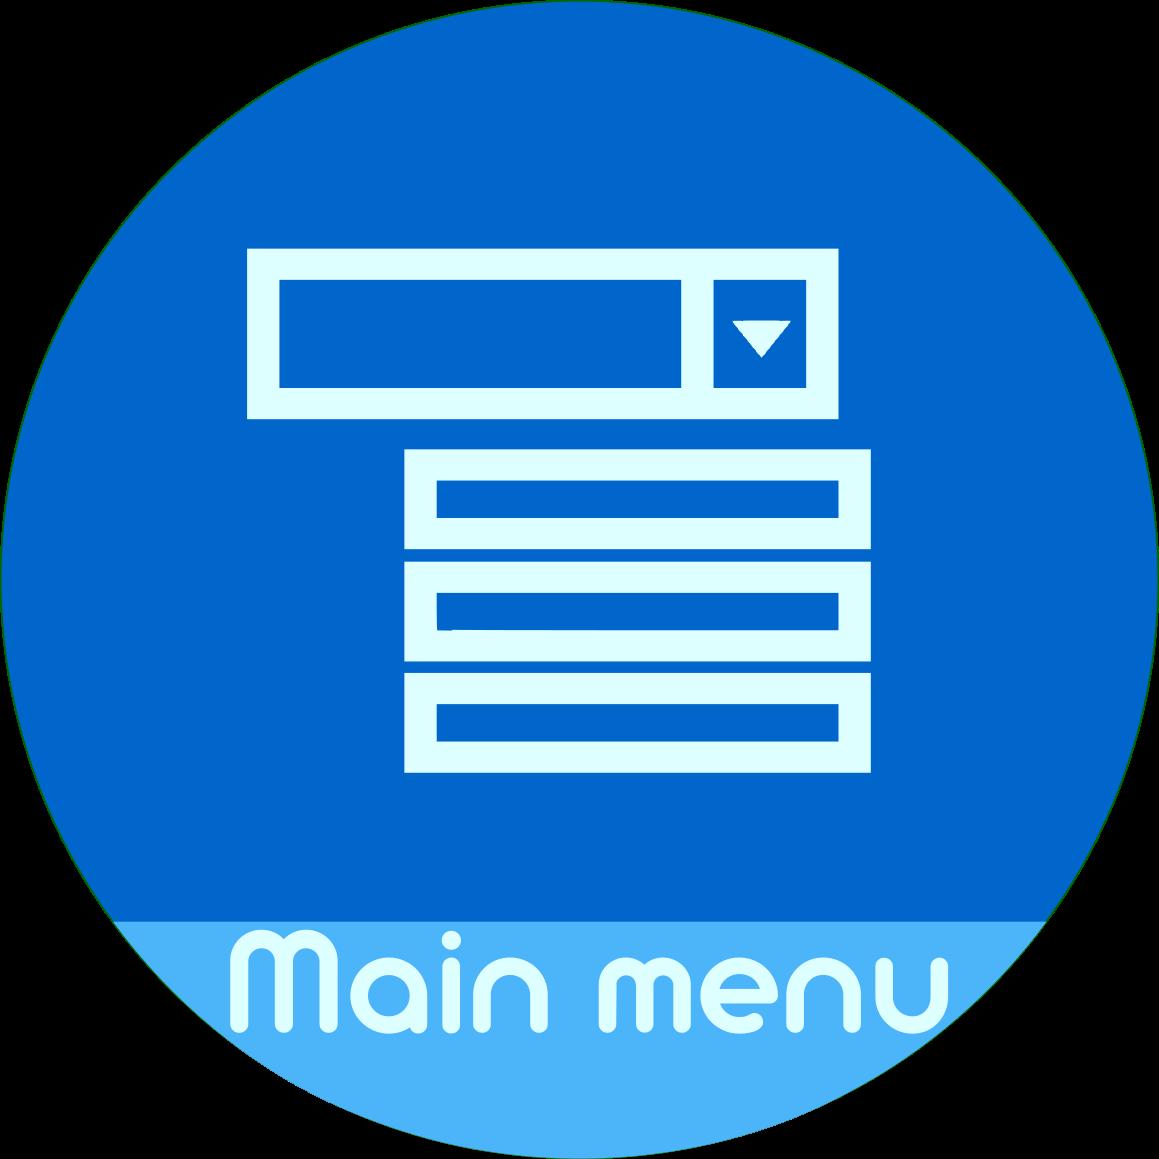 mainmenu-services.png